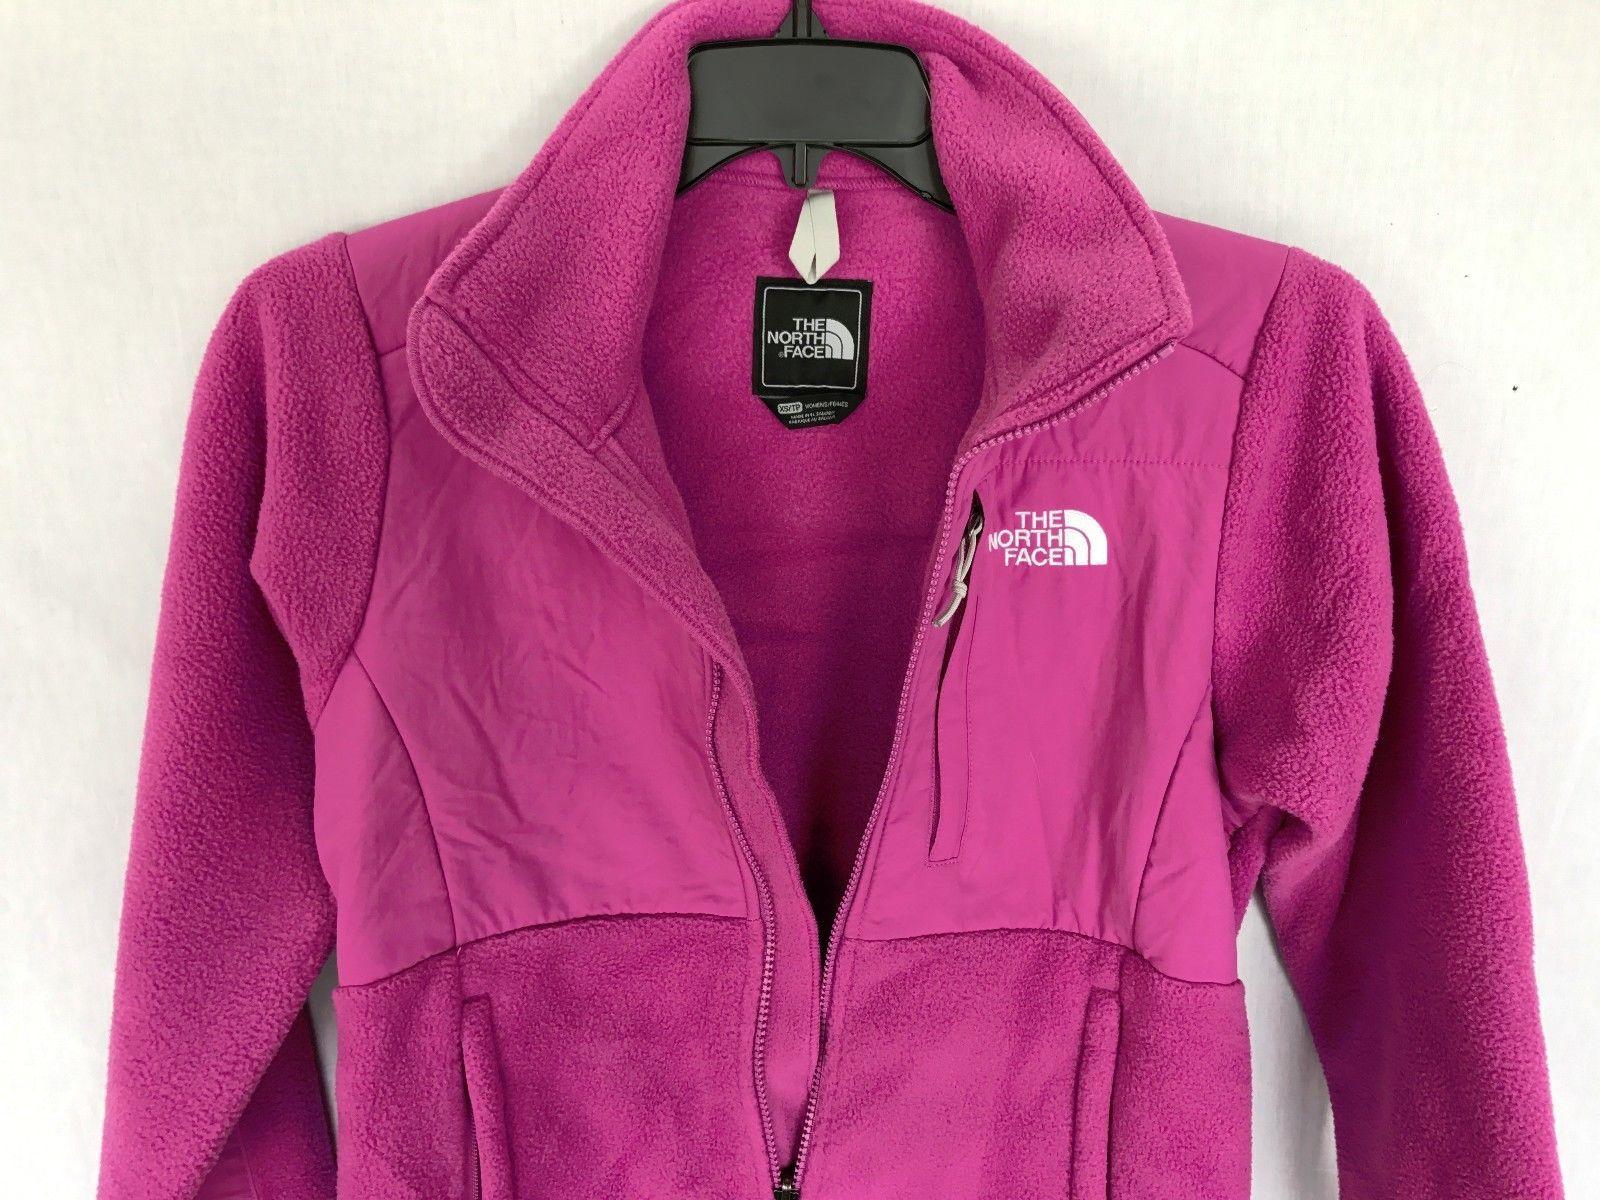 NWT The North Face Denali Women's Classic Fleace Jacket Plum XS Anlp